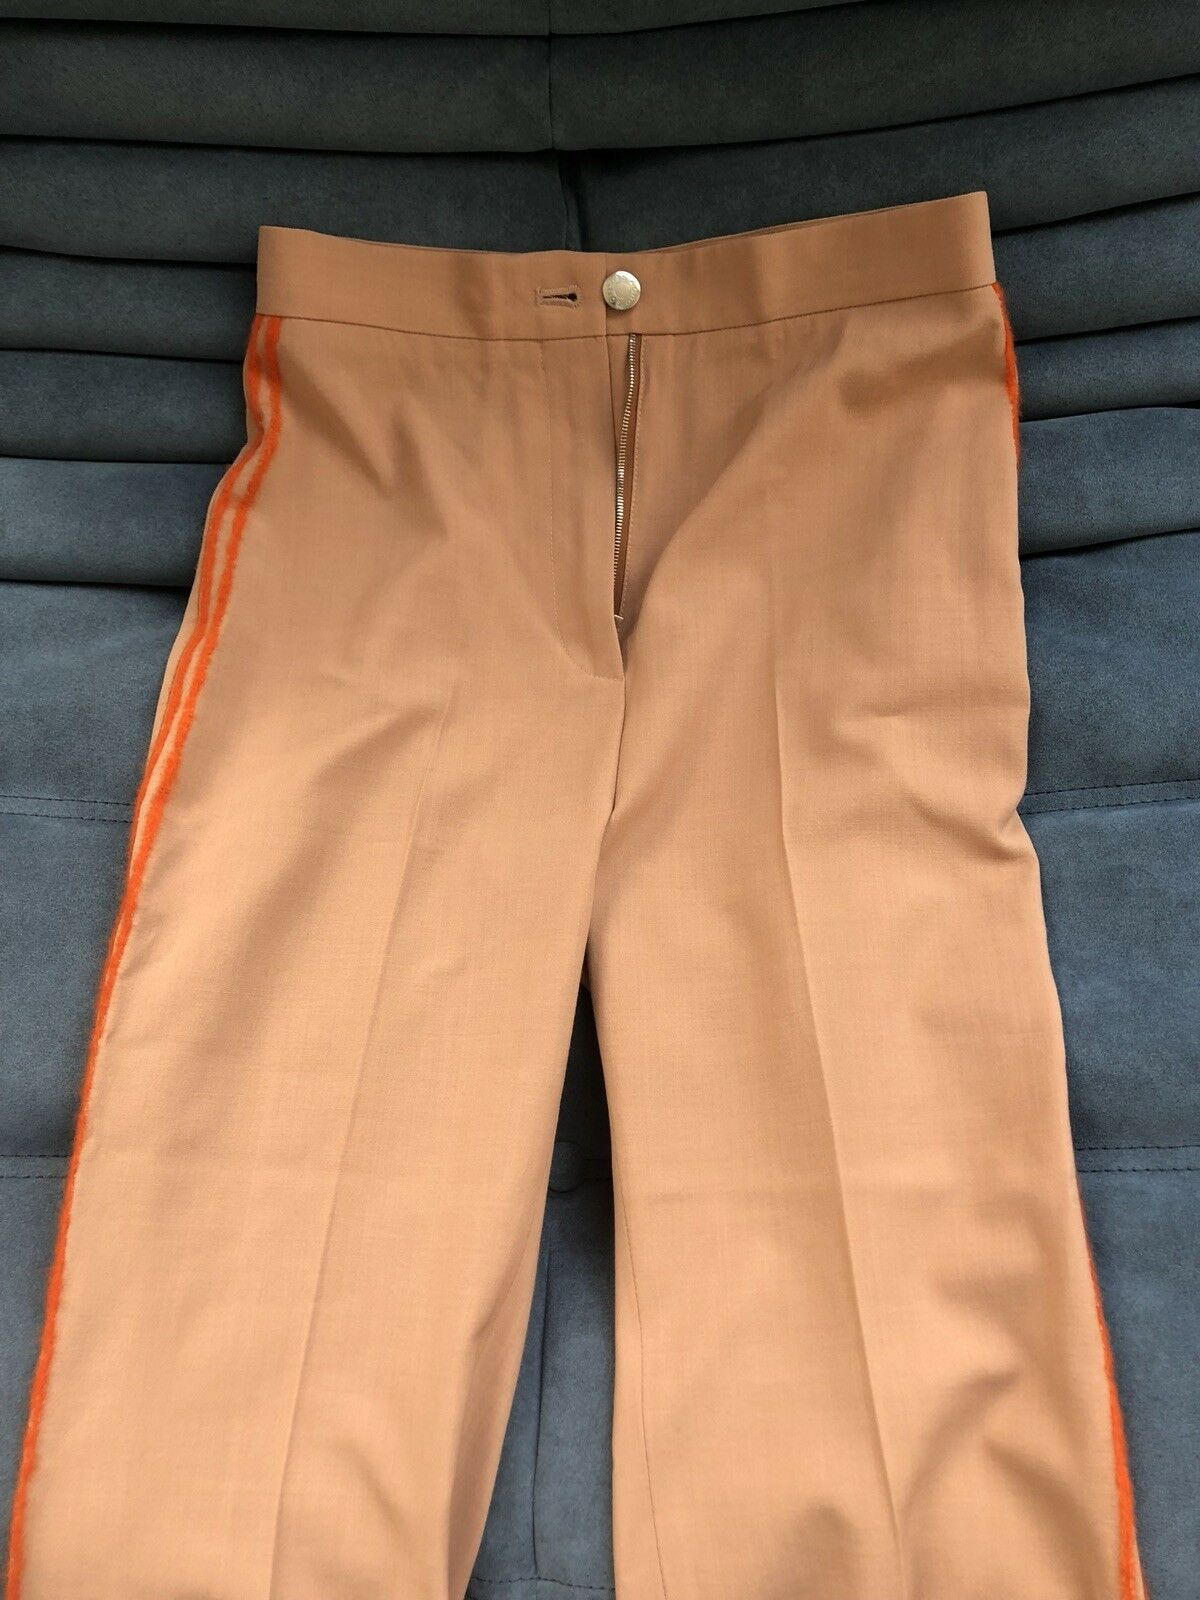 Acne Myla crepe trousers